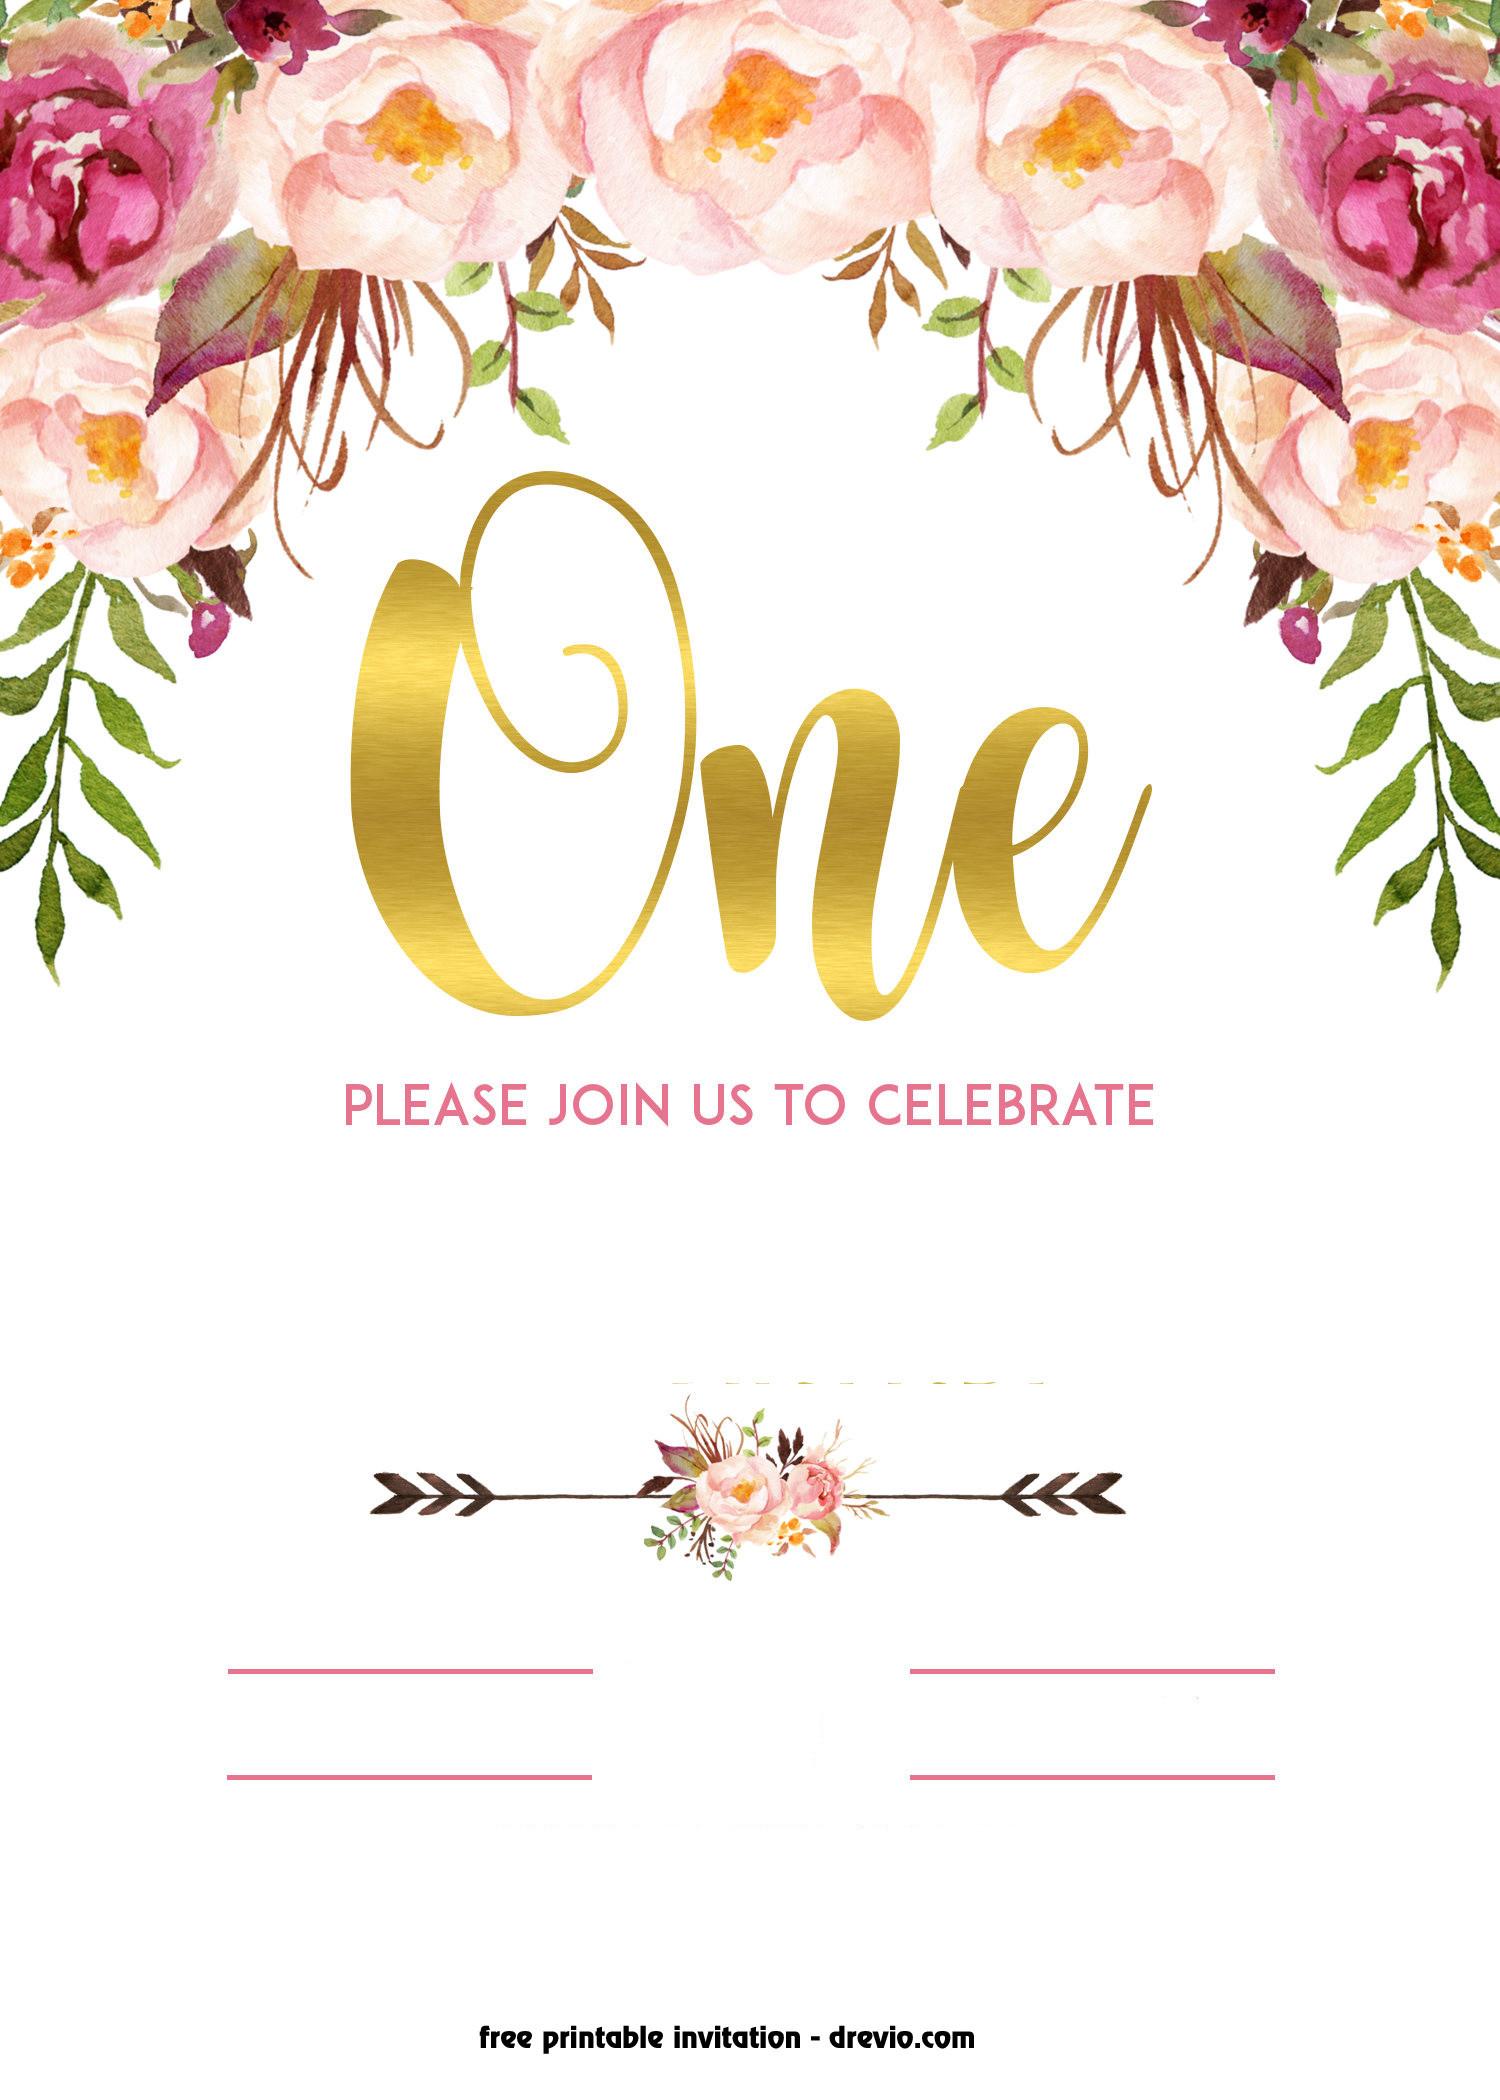 Free Templates For Birthday Invitations  FREE Printable 1st Birthday Invitation – Vintage Style